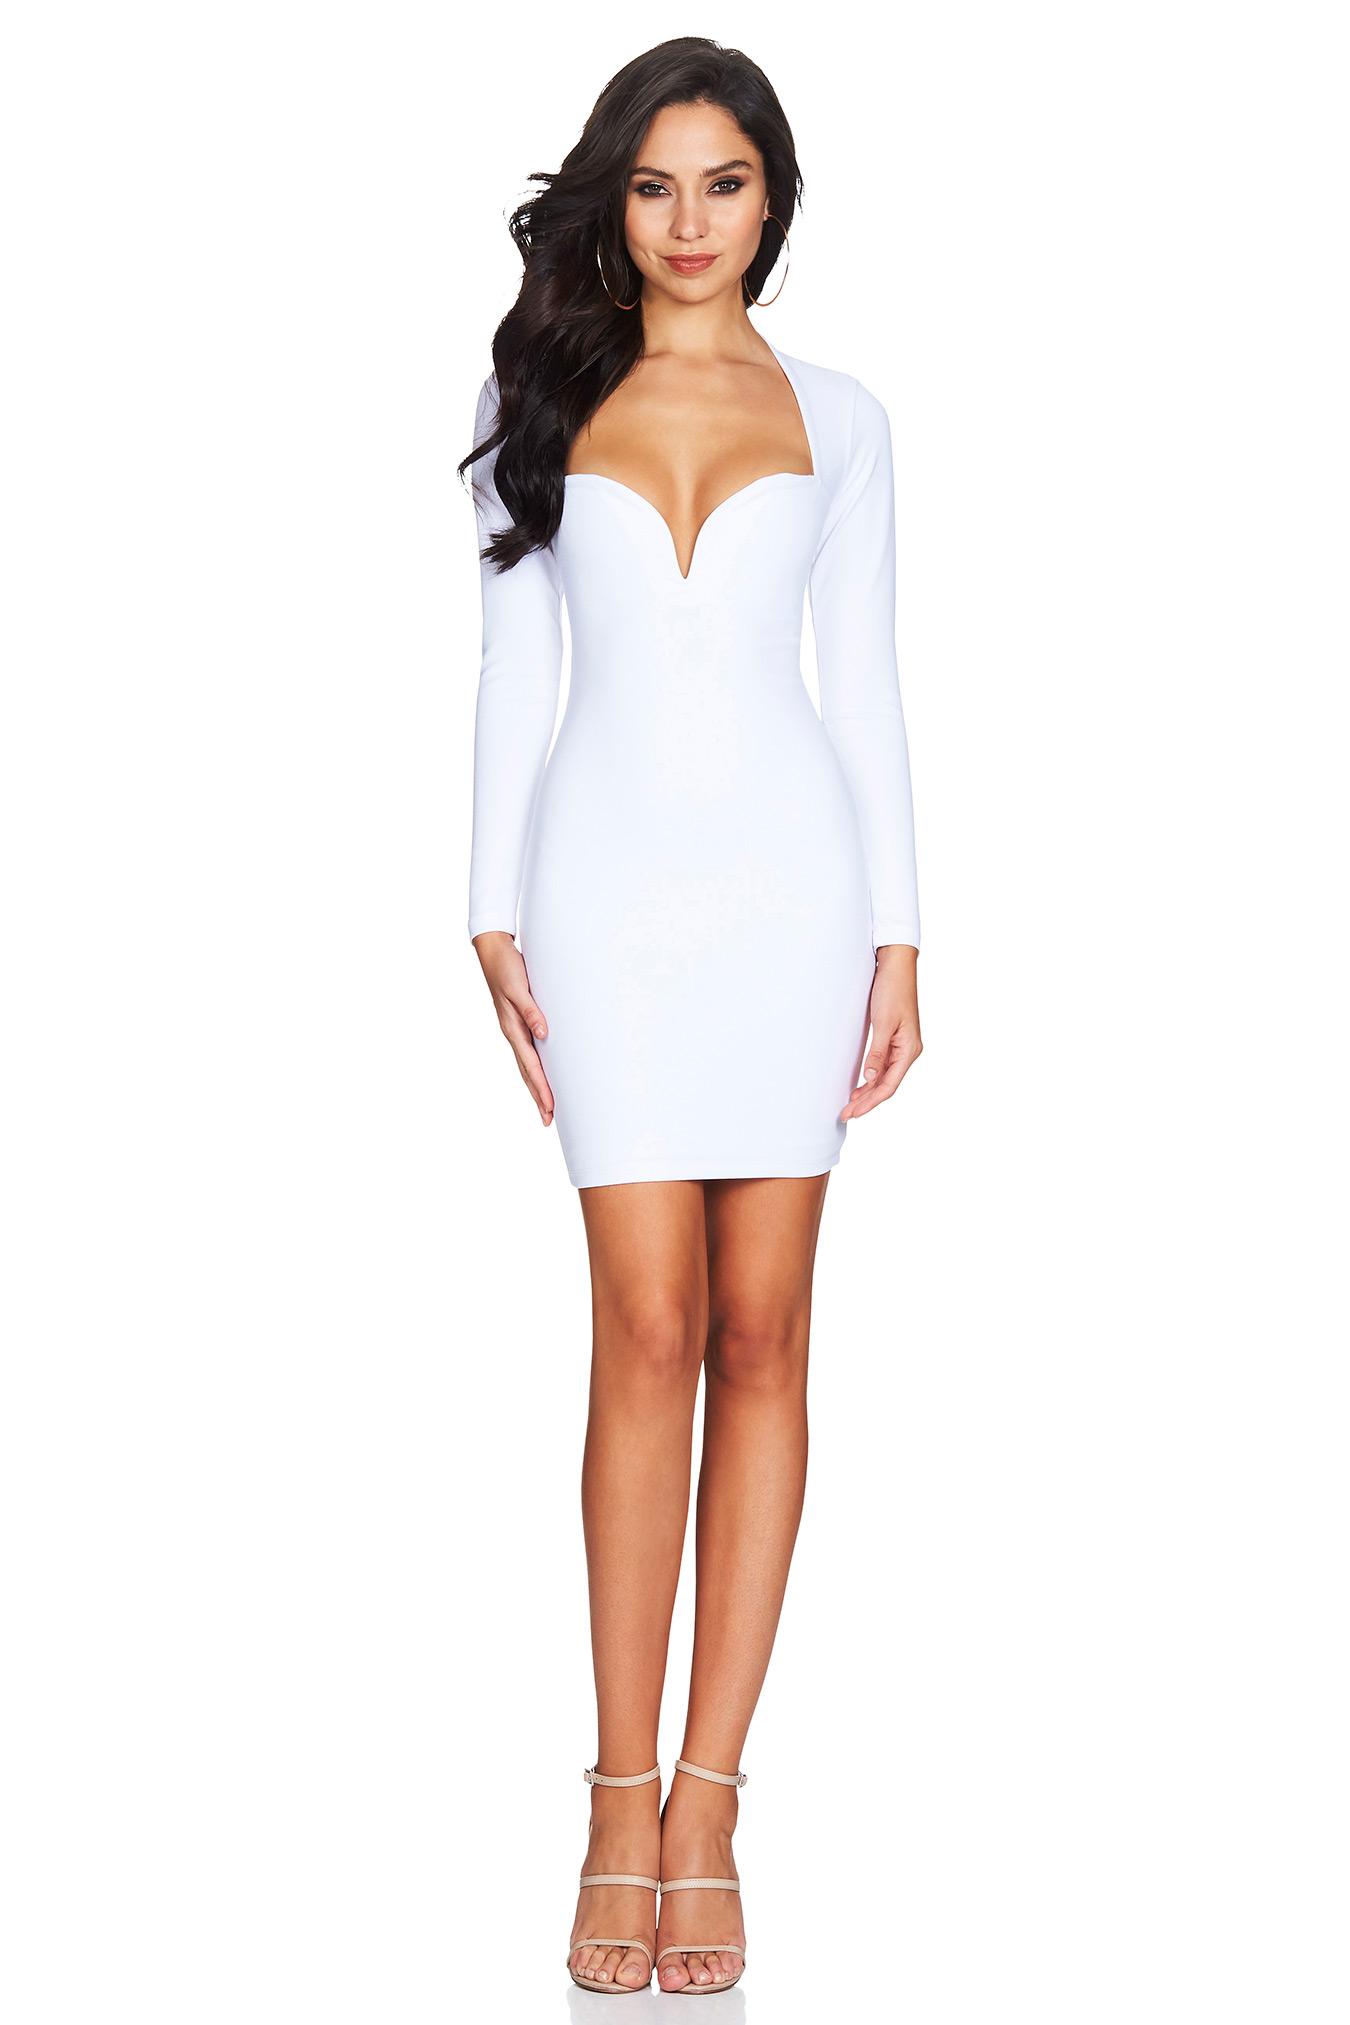 White Madonna Long Sleeve Mini : Buy Designer Dresses Online at Nookie